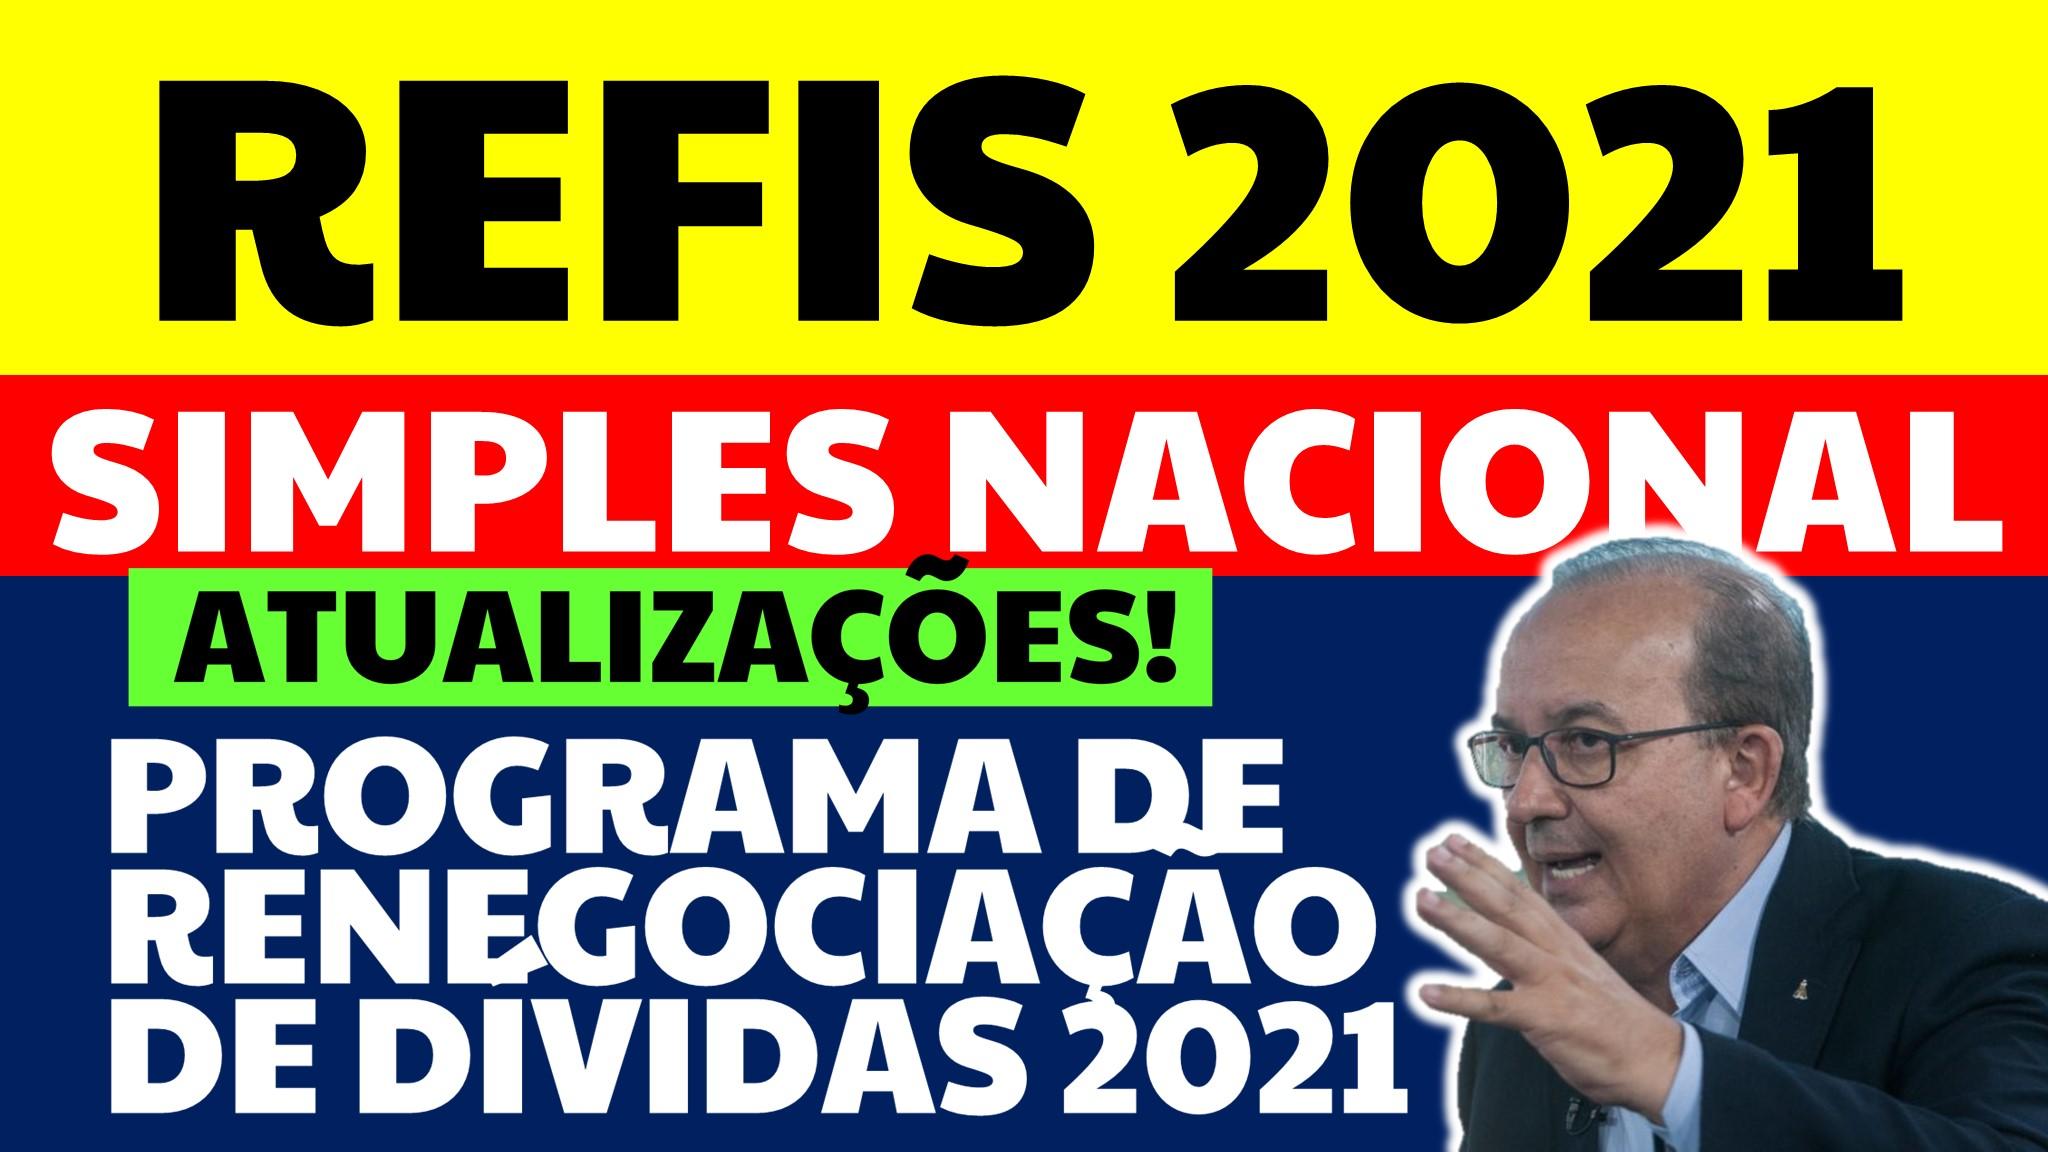 REFIS DO SIMPLES NACIONAL 2021